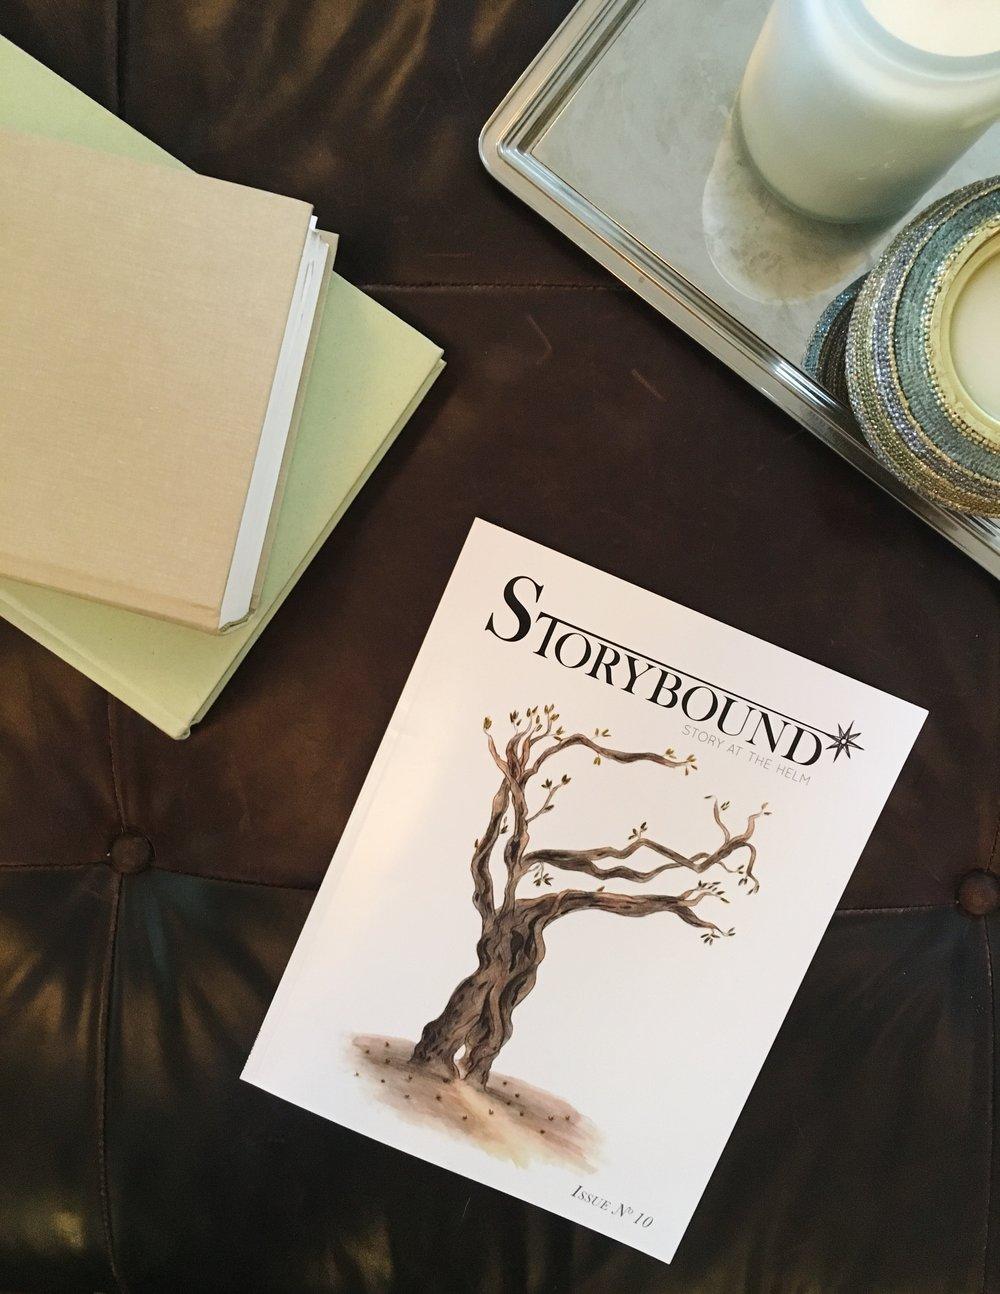 Storybound Magazine - Issue 10 cover-1.jpg